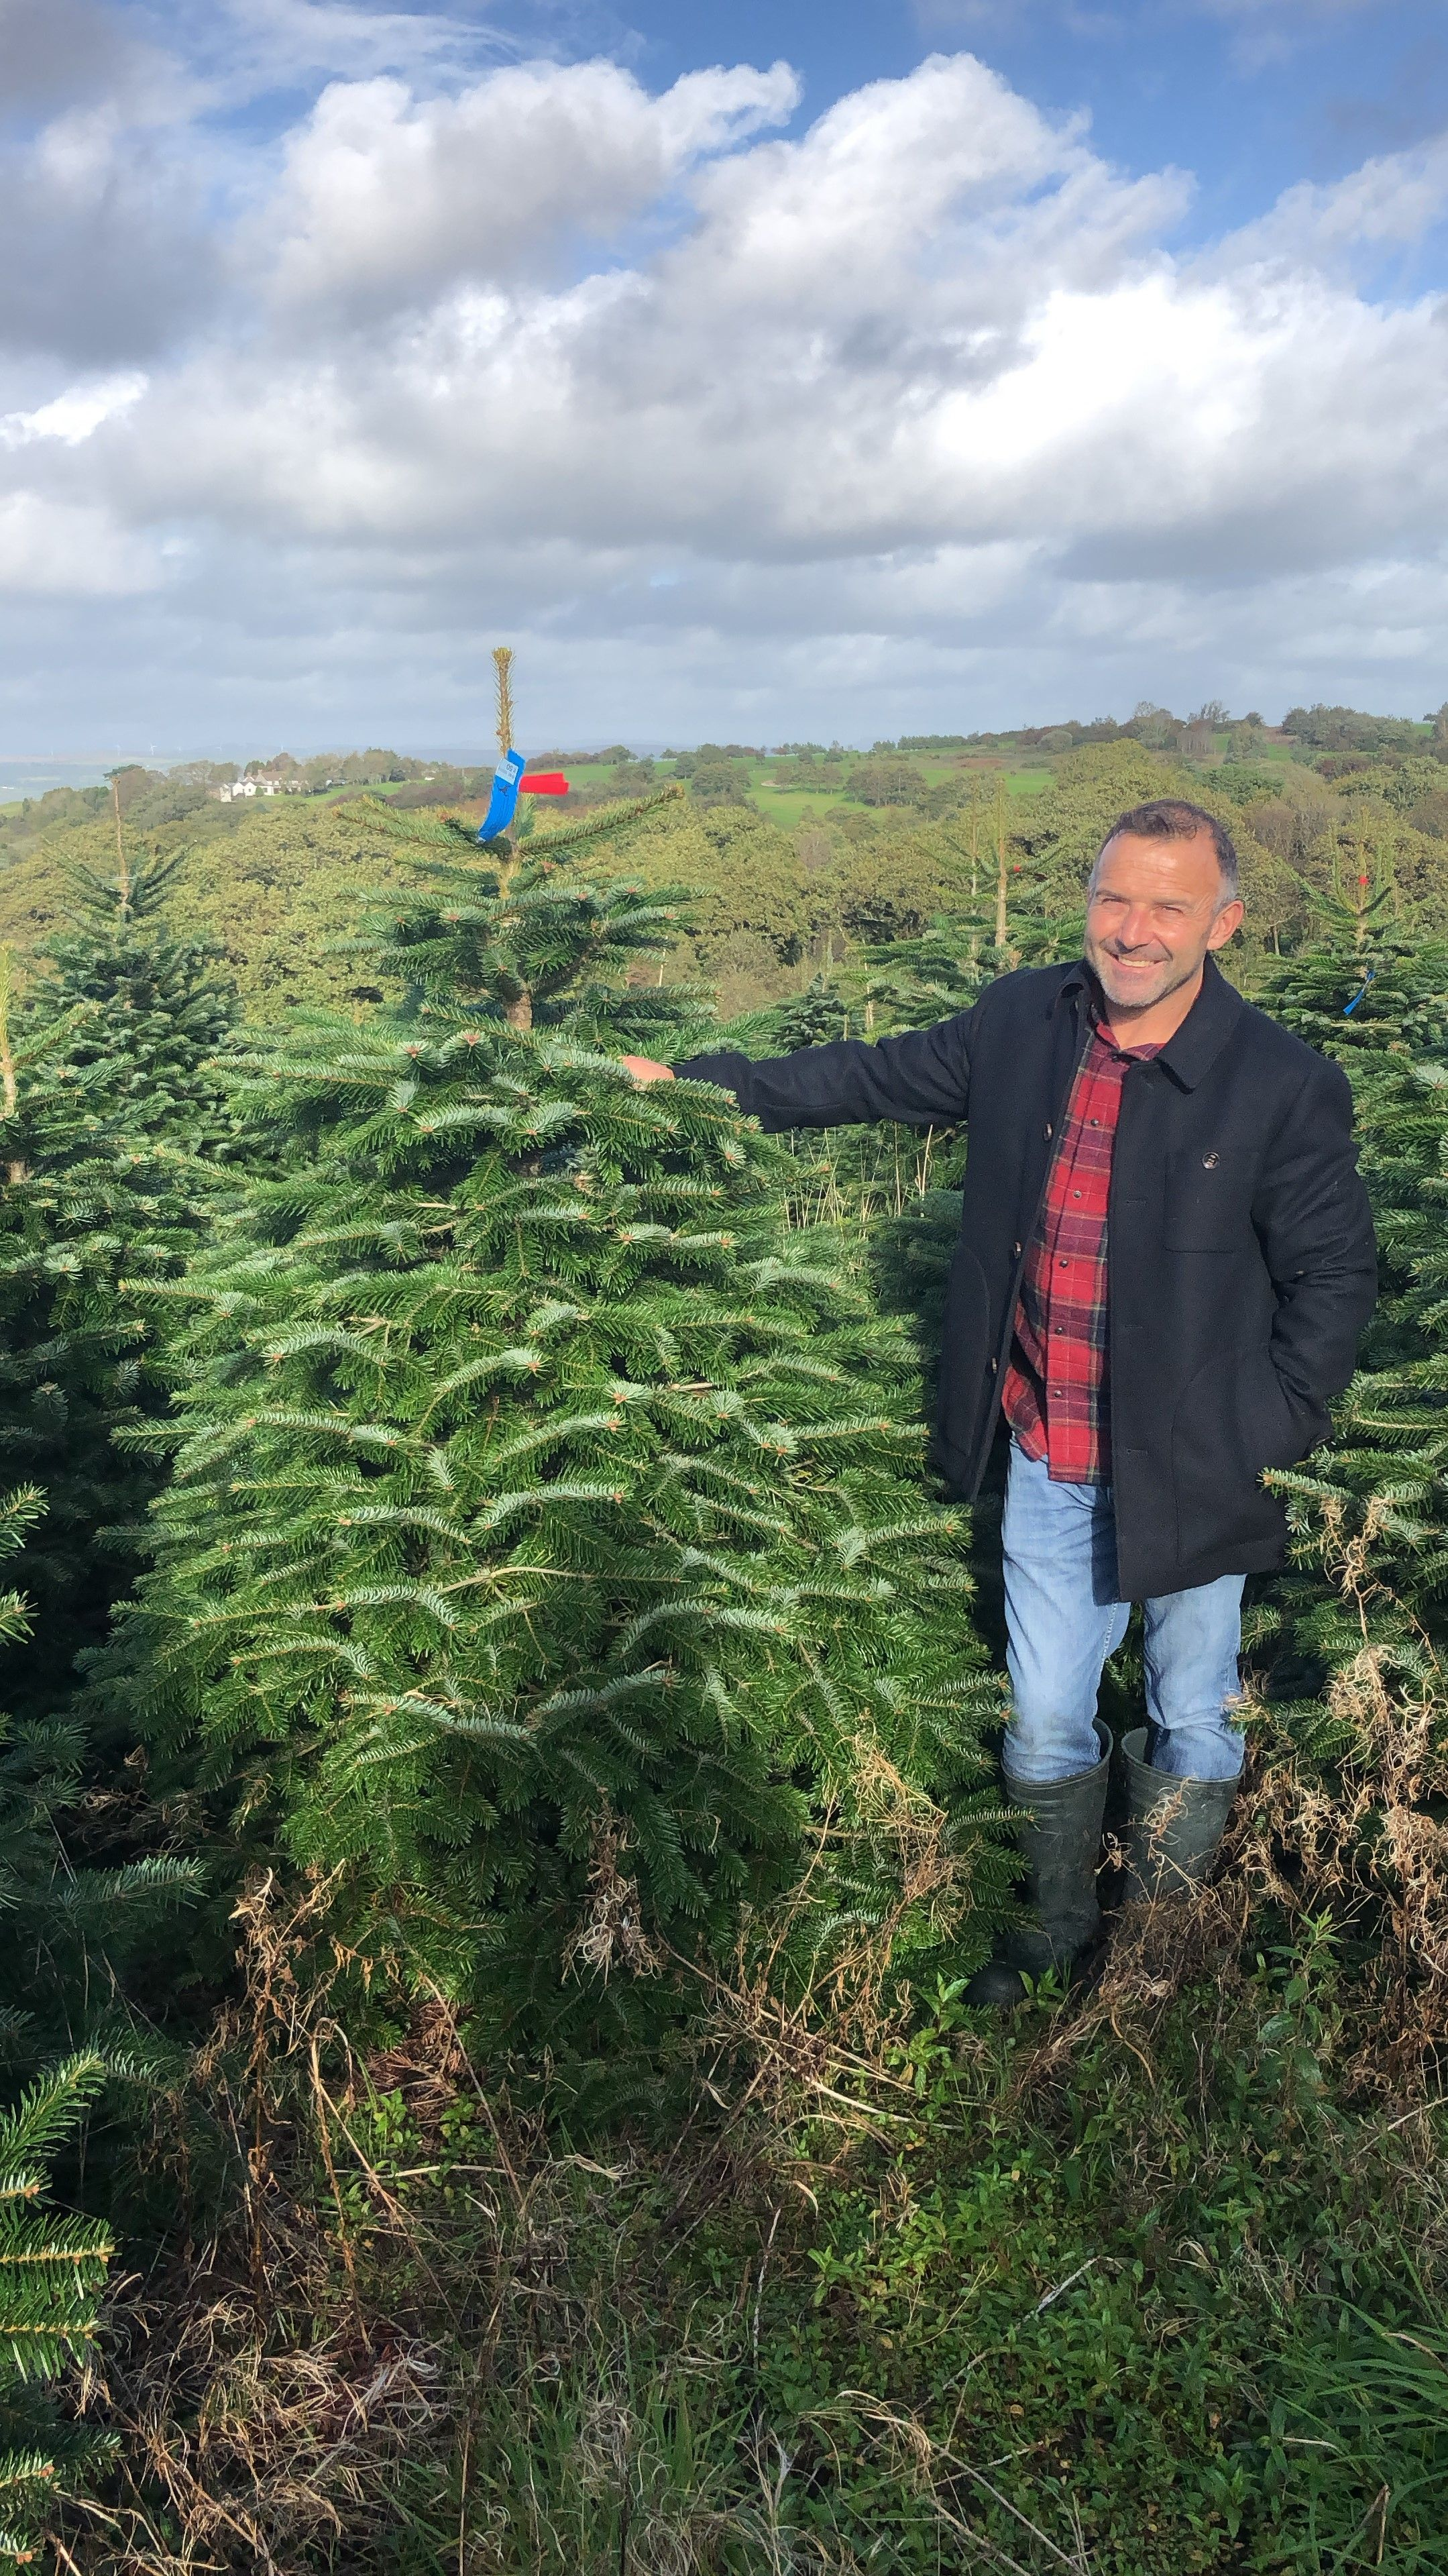 Rob Morgan Owner Of Gower Fresh Christmas Trees Thisismywales Fresh Christmas Trees Natural Landmarks Rob Morgan